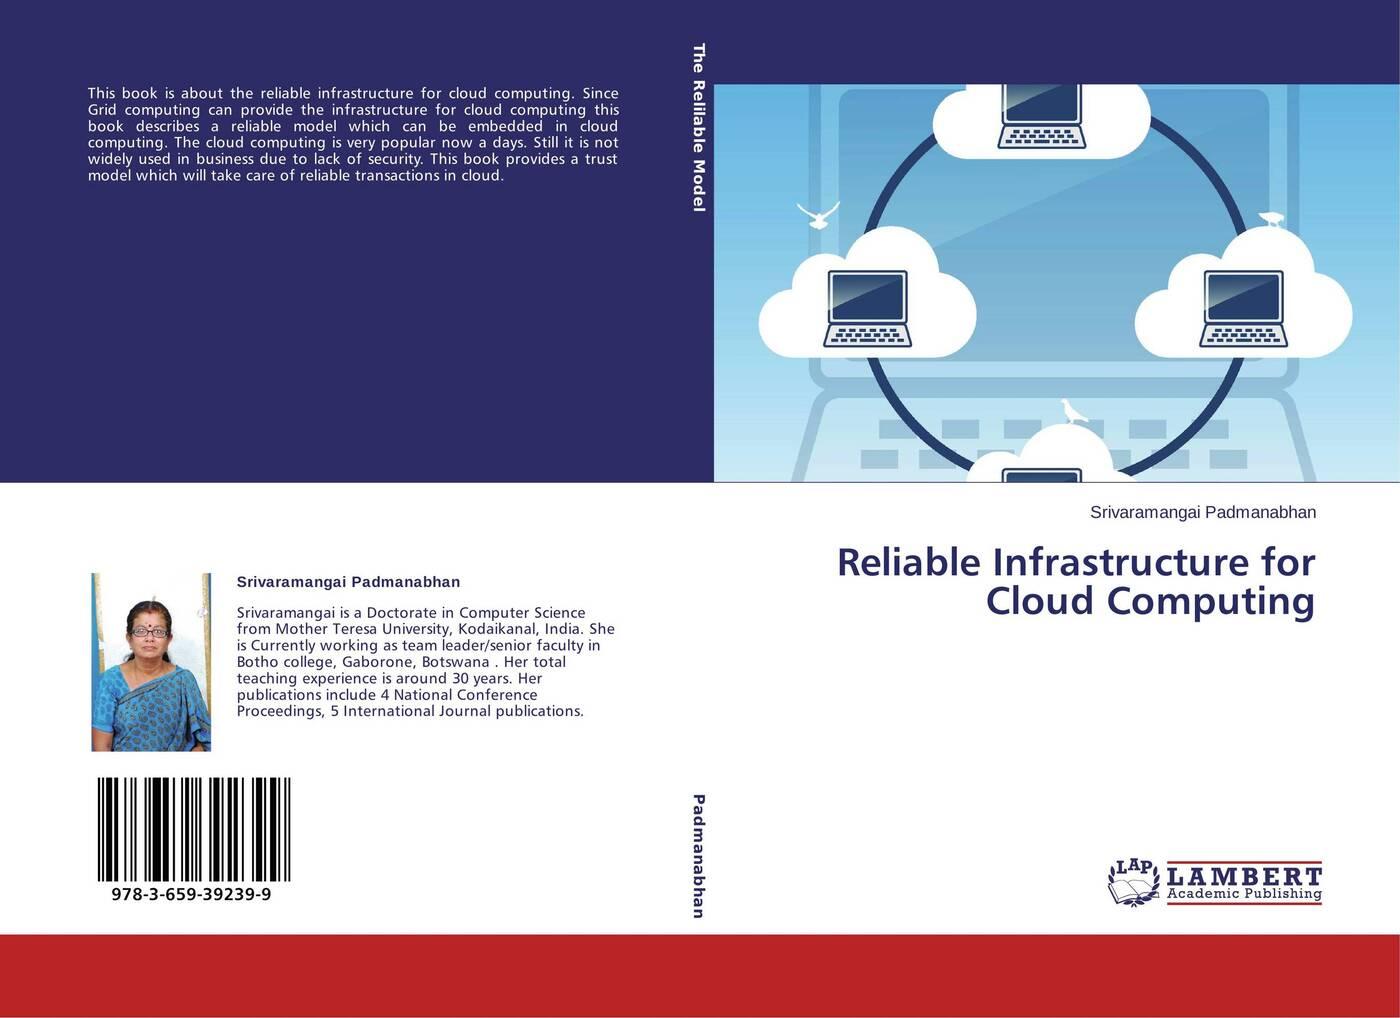 Srivaramangai Padmanabhan Reliable Infrastructure for Cloud Computing